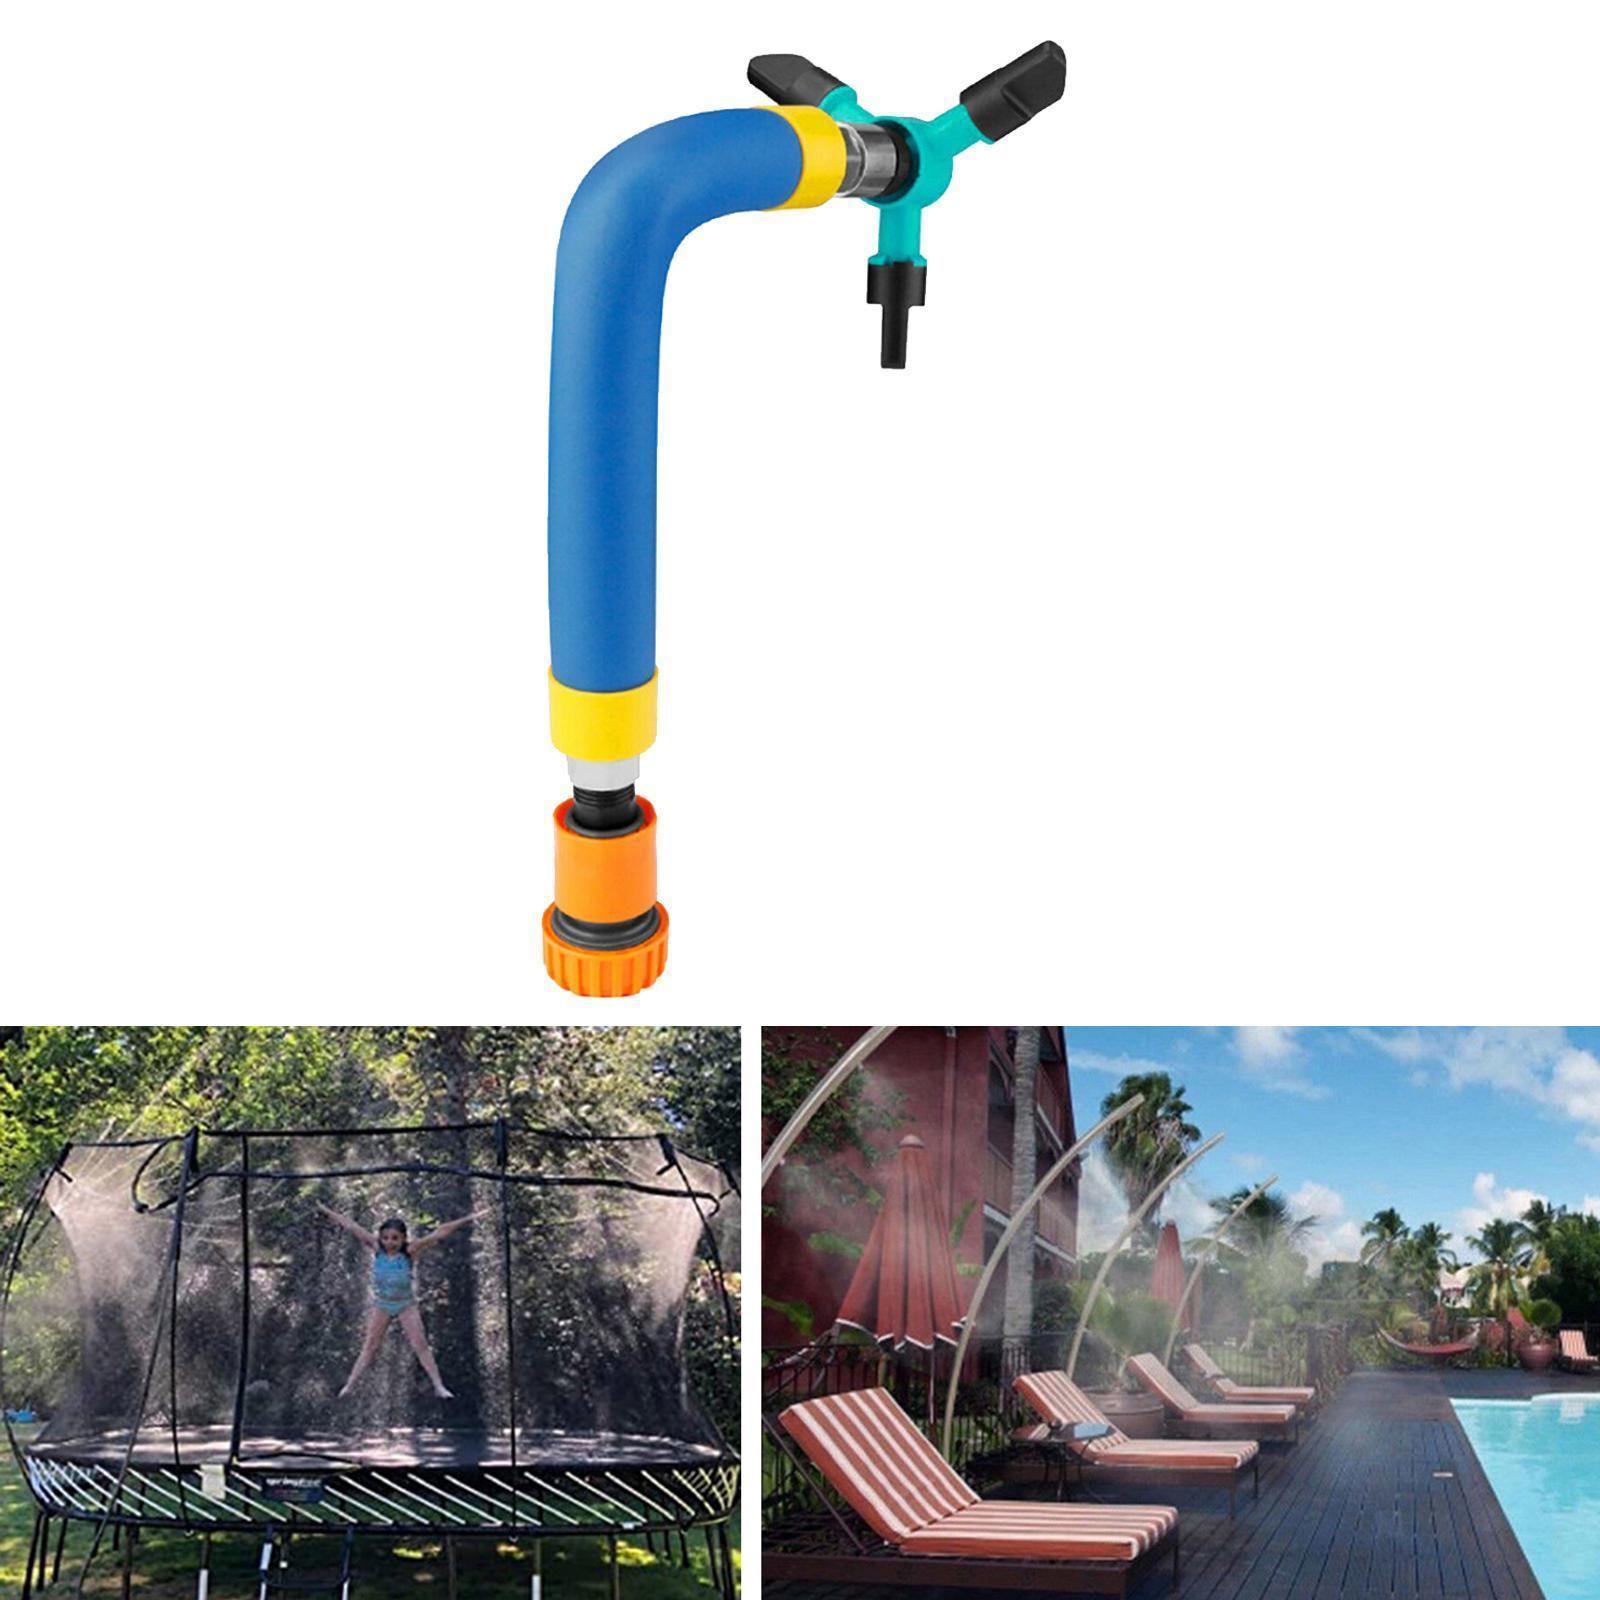 miniatura 3 - Trampolino di Acqua Sprinkler A Spruzzo Nebbia Giardino Estate Giochi